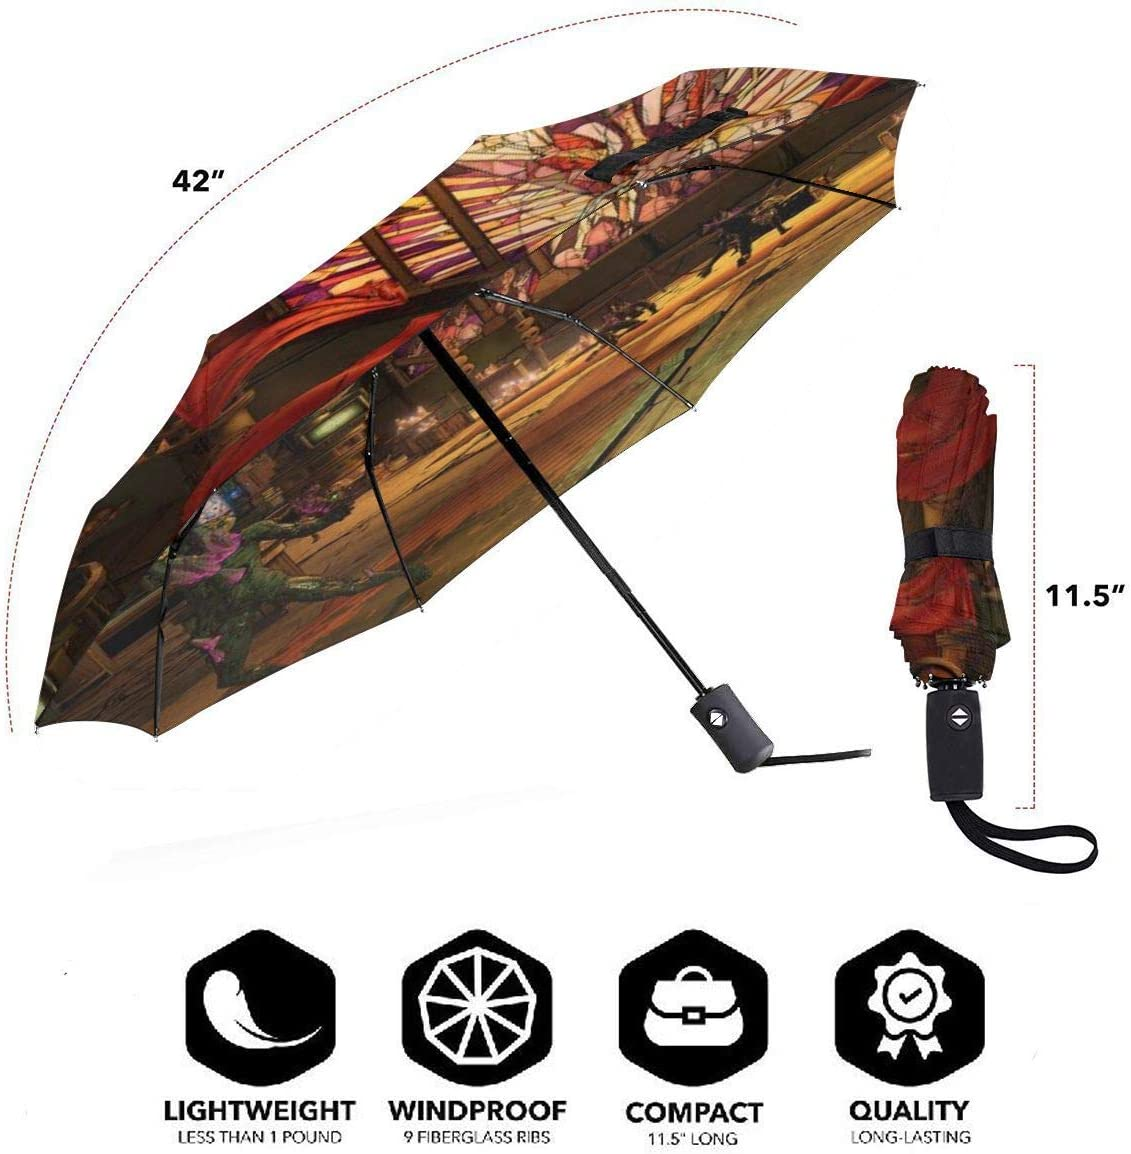 Borderlands 3 Candle 3D Pattern PG Cloth Lightweight Foldable Tri-fold Umbrealla For Rain Sunshade Anti-UV,Qucik-dry Wind Resistance Automatic Umbrellas